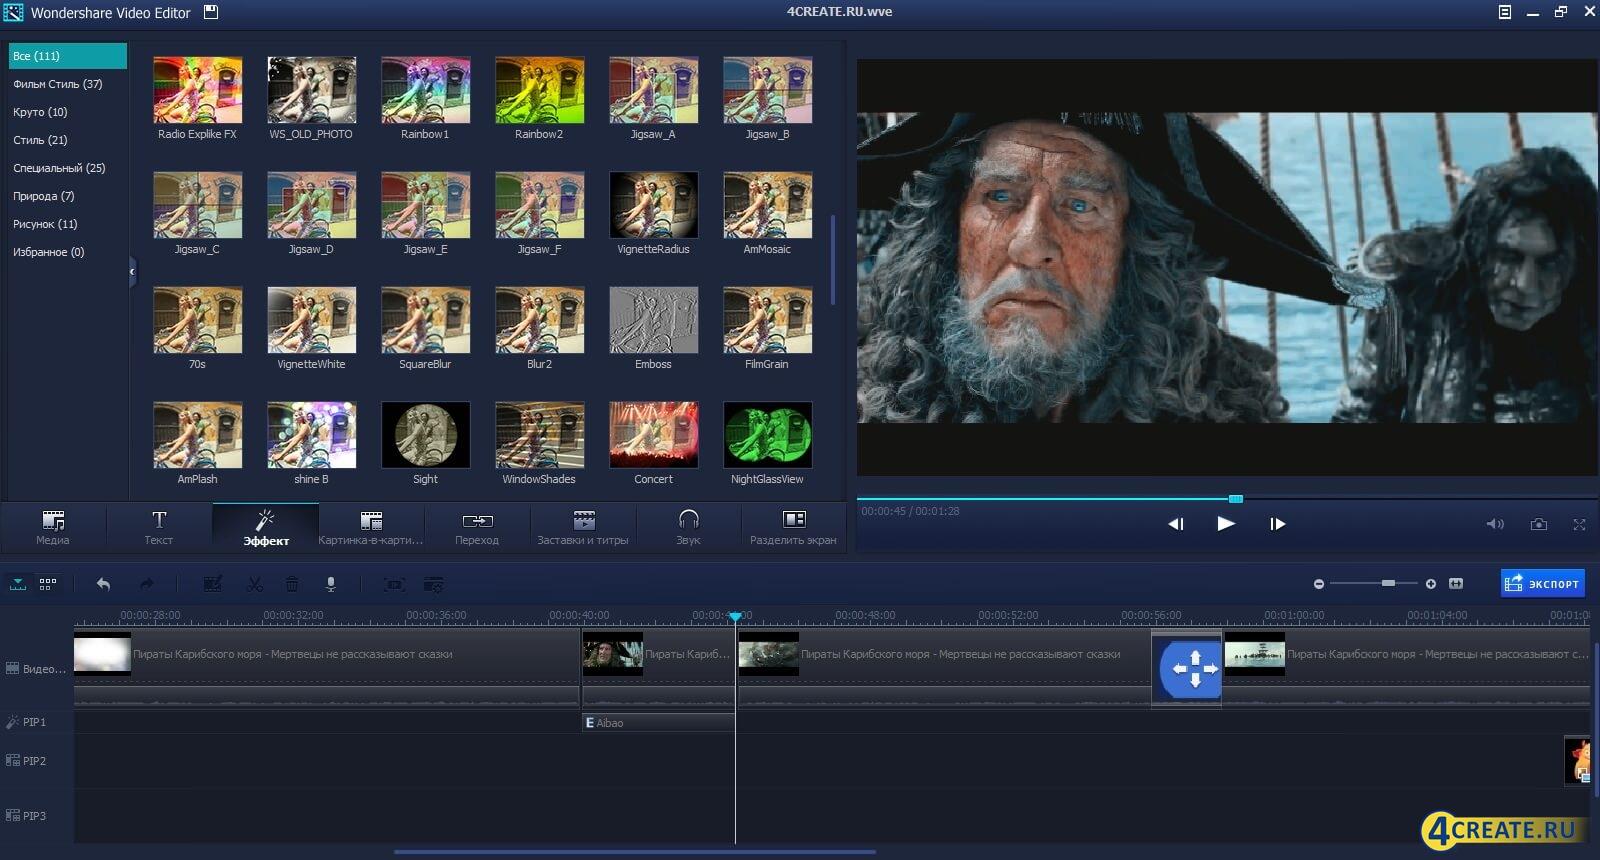 Wondershare Video Editor 5.1 (Скриншот 2)